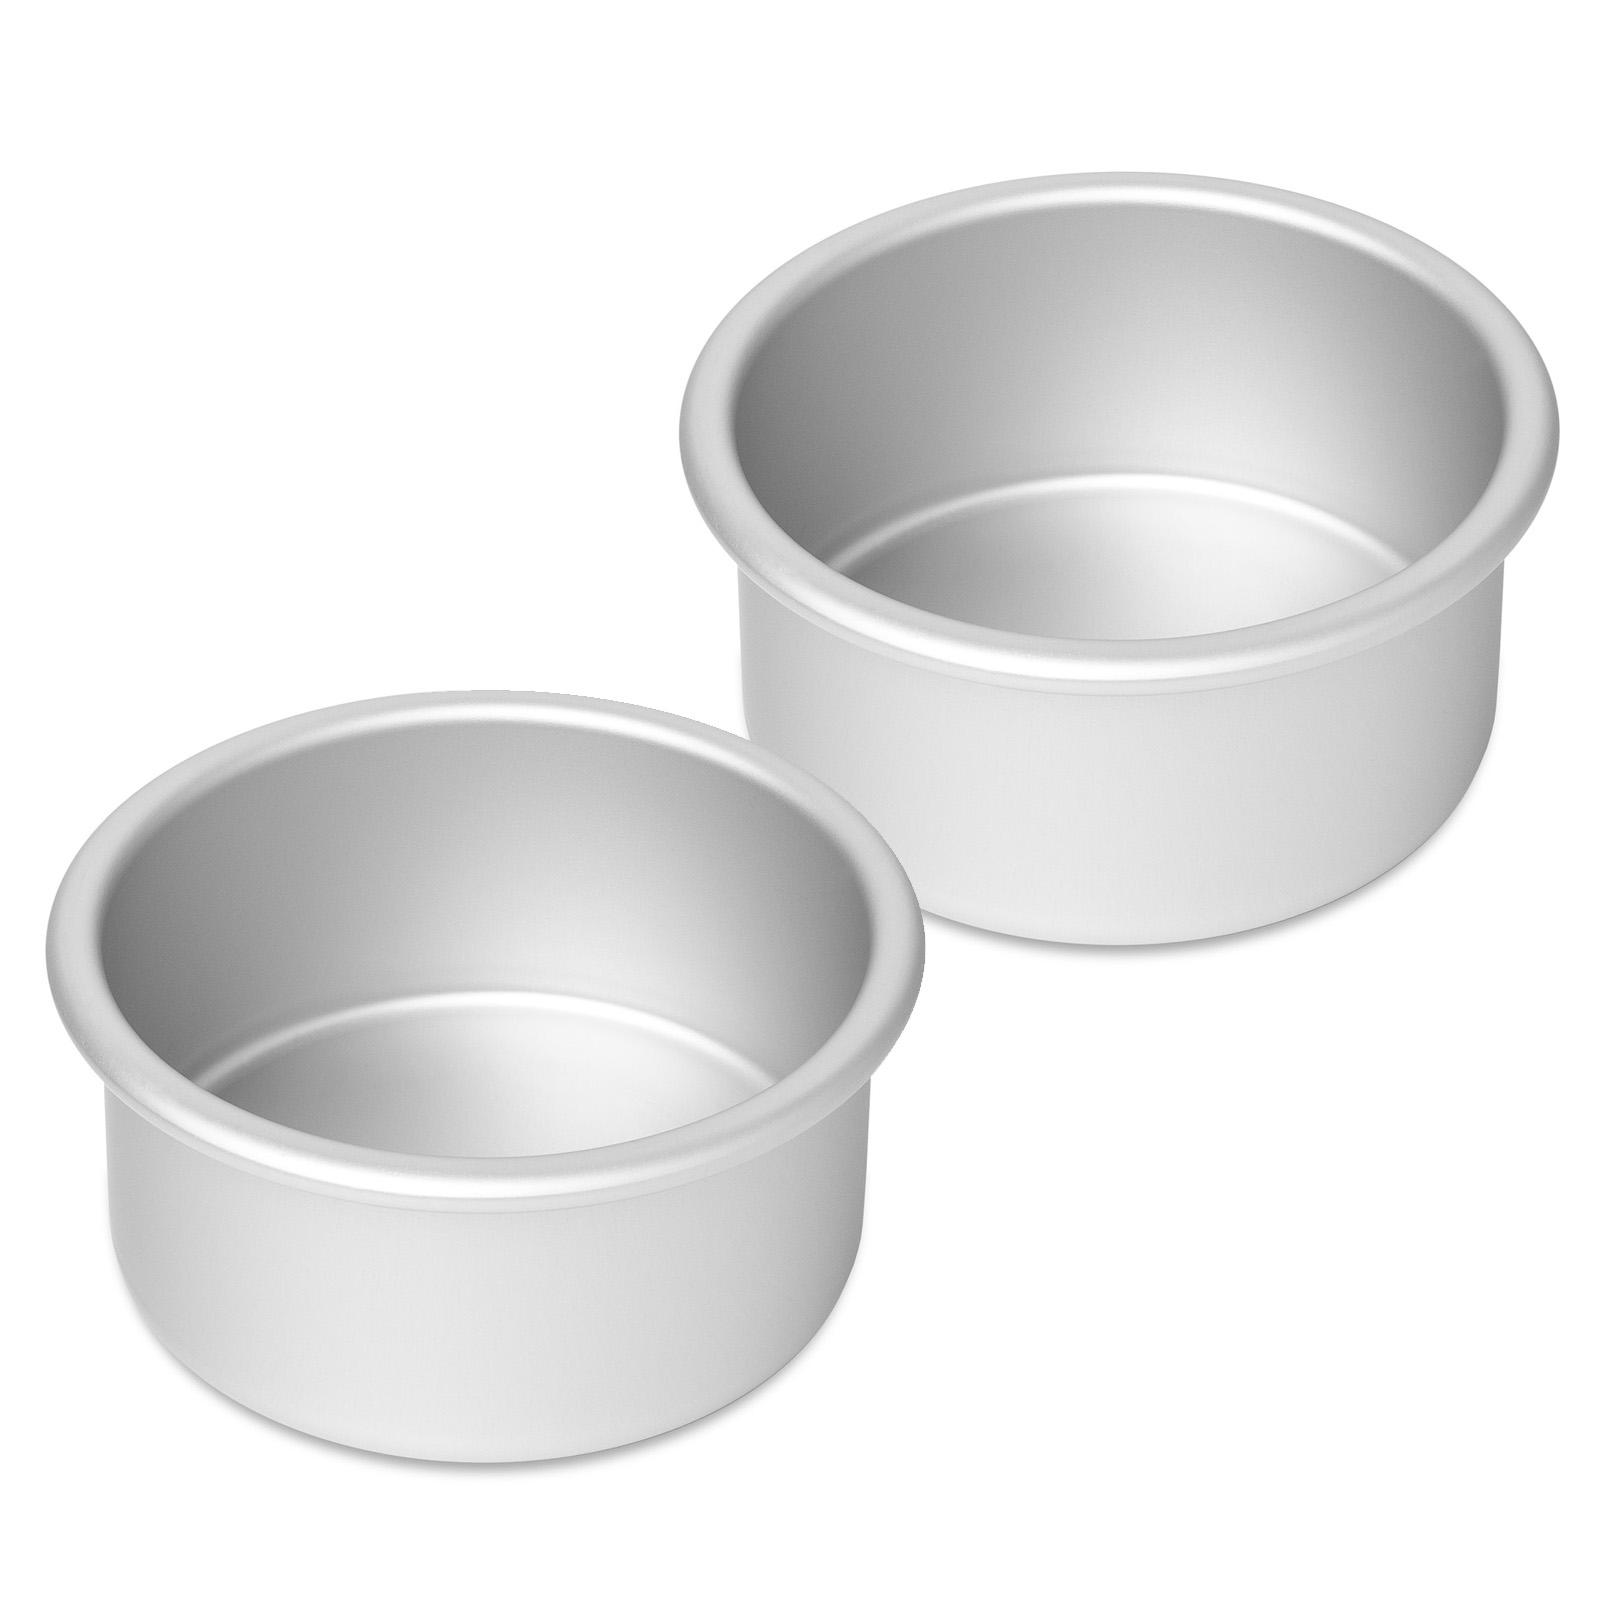 Professional Round Aluminum Cake Pans Baking Tins